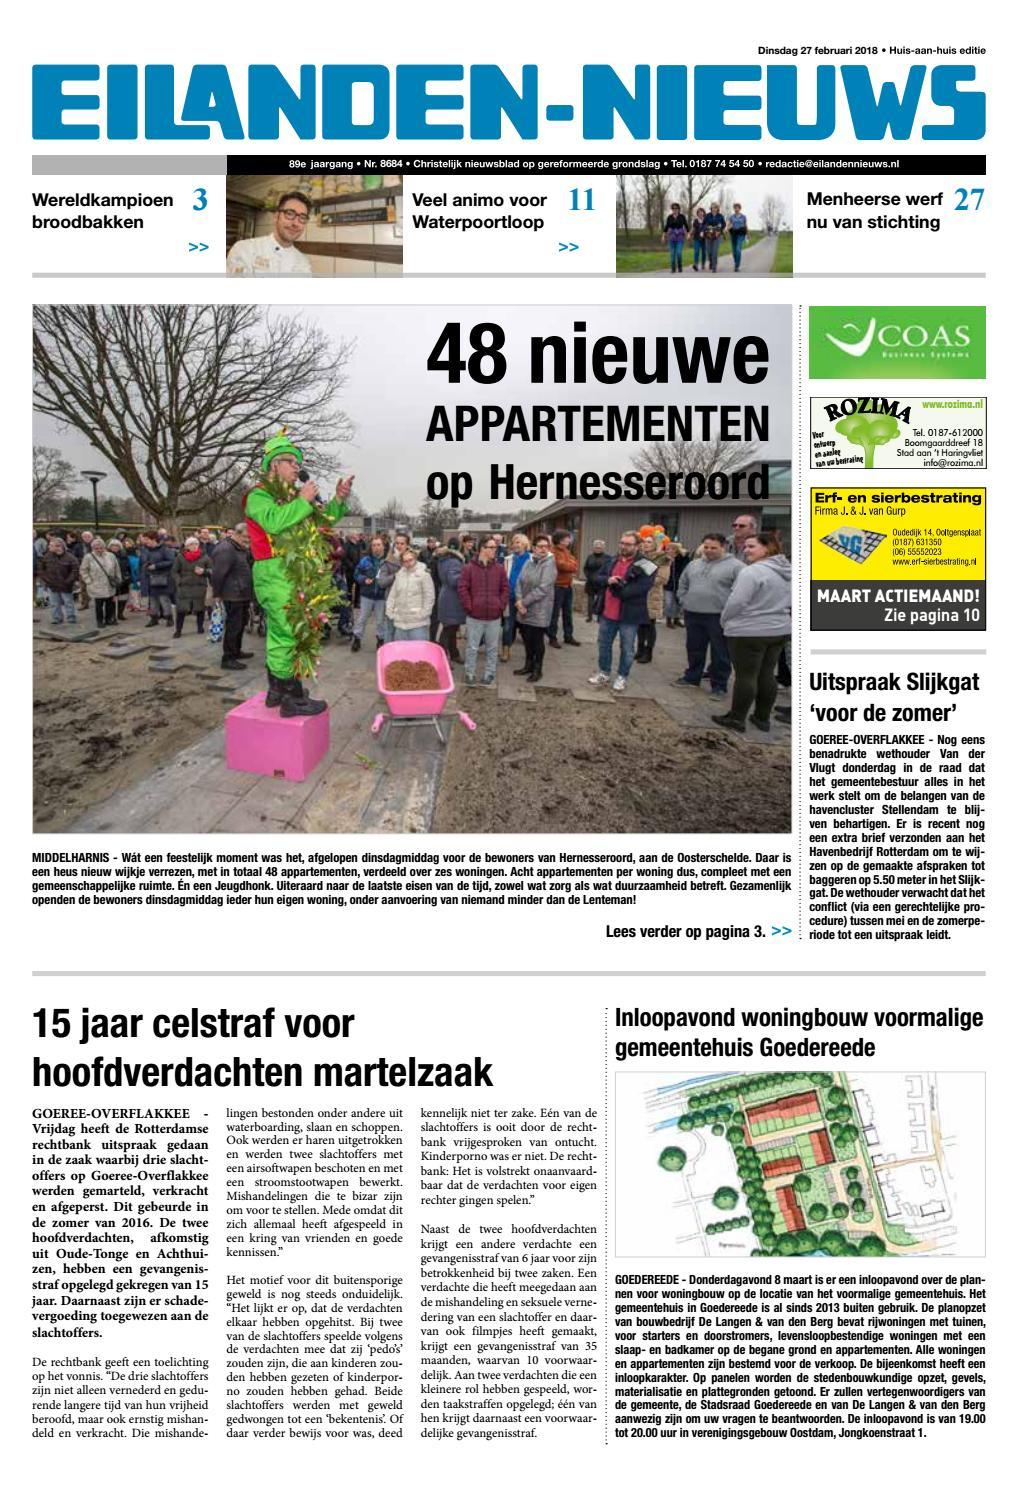 2d623a18374 Eilanden-Nieuws 27 februari 2018 by Eilanden-Nieuws - issuu